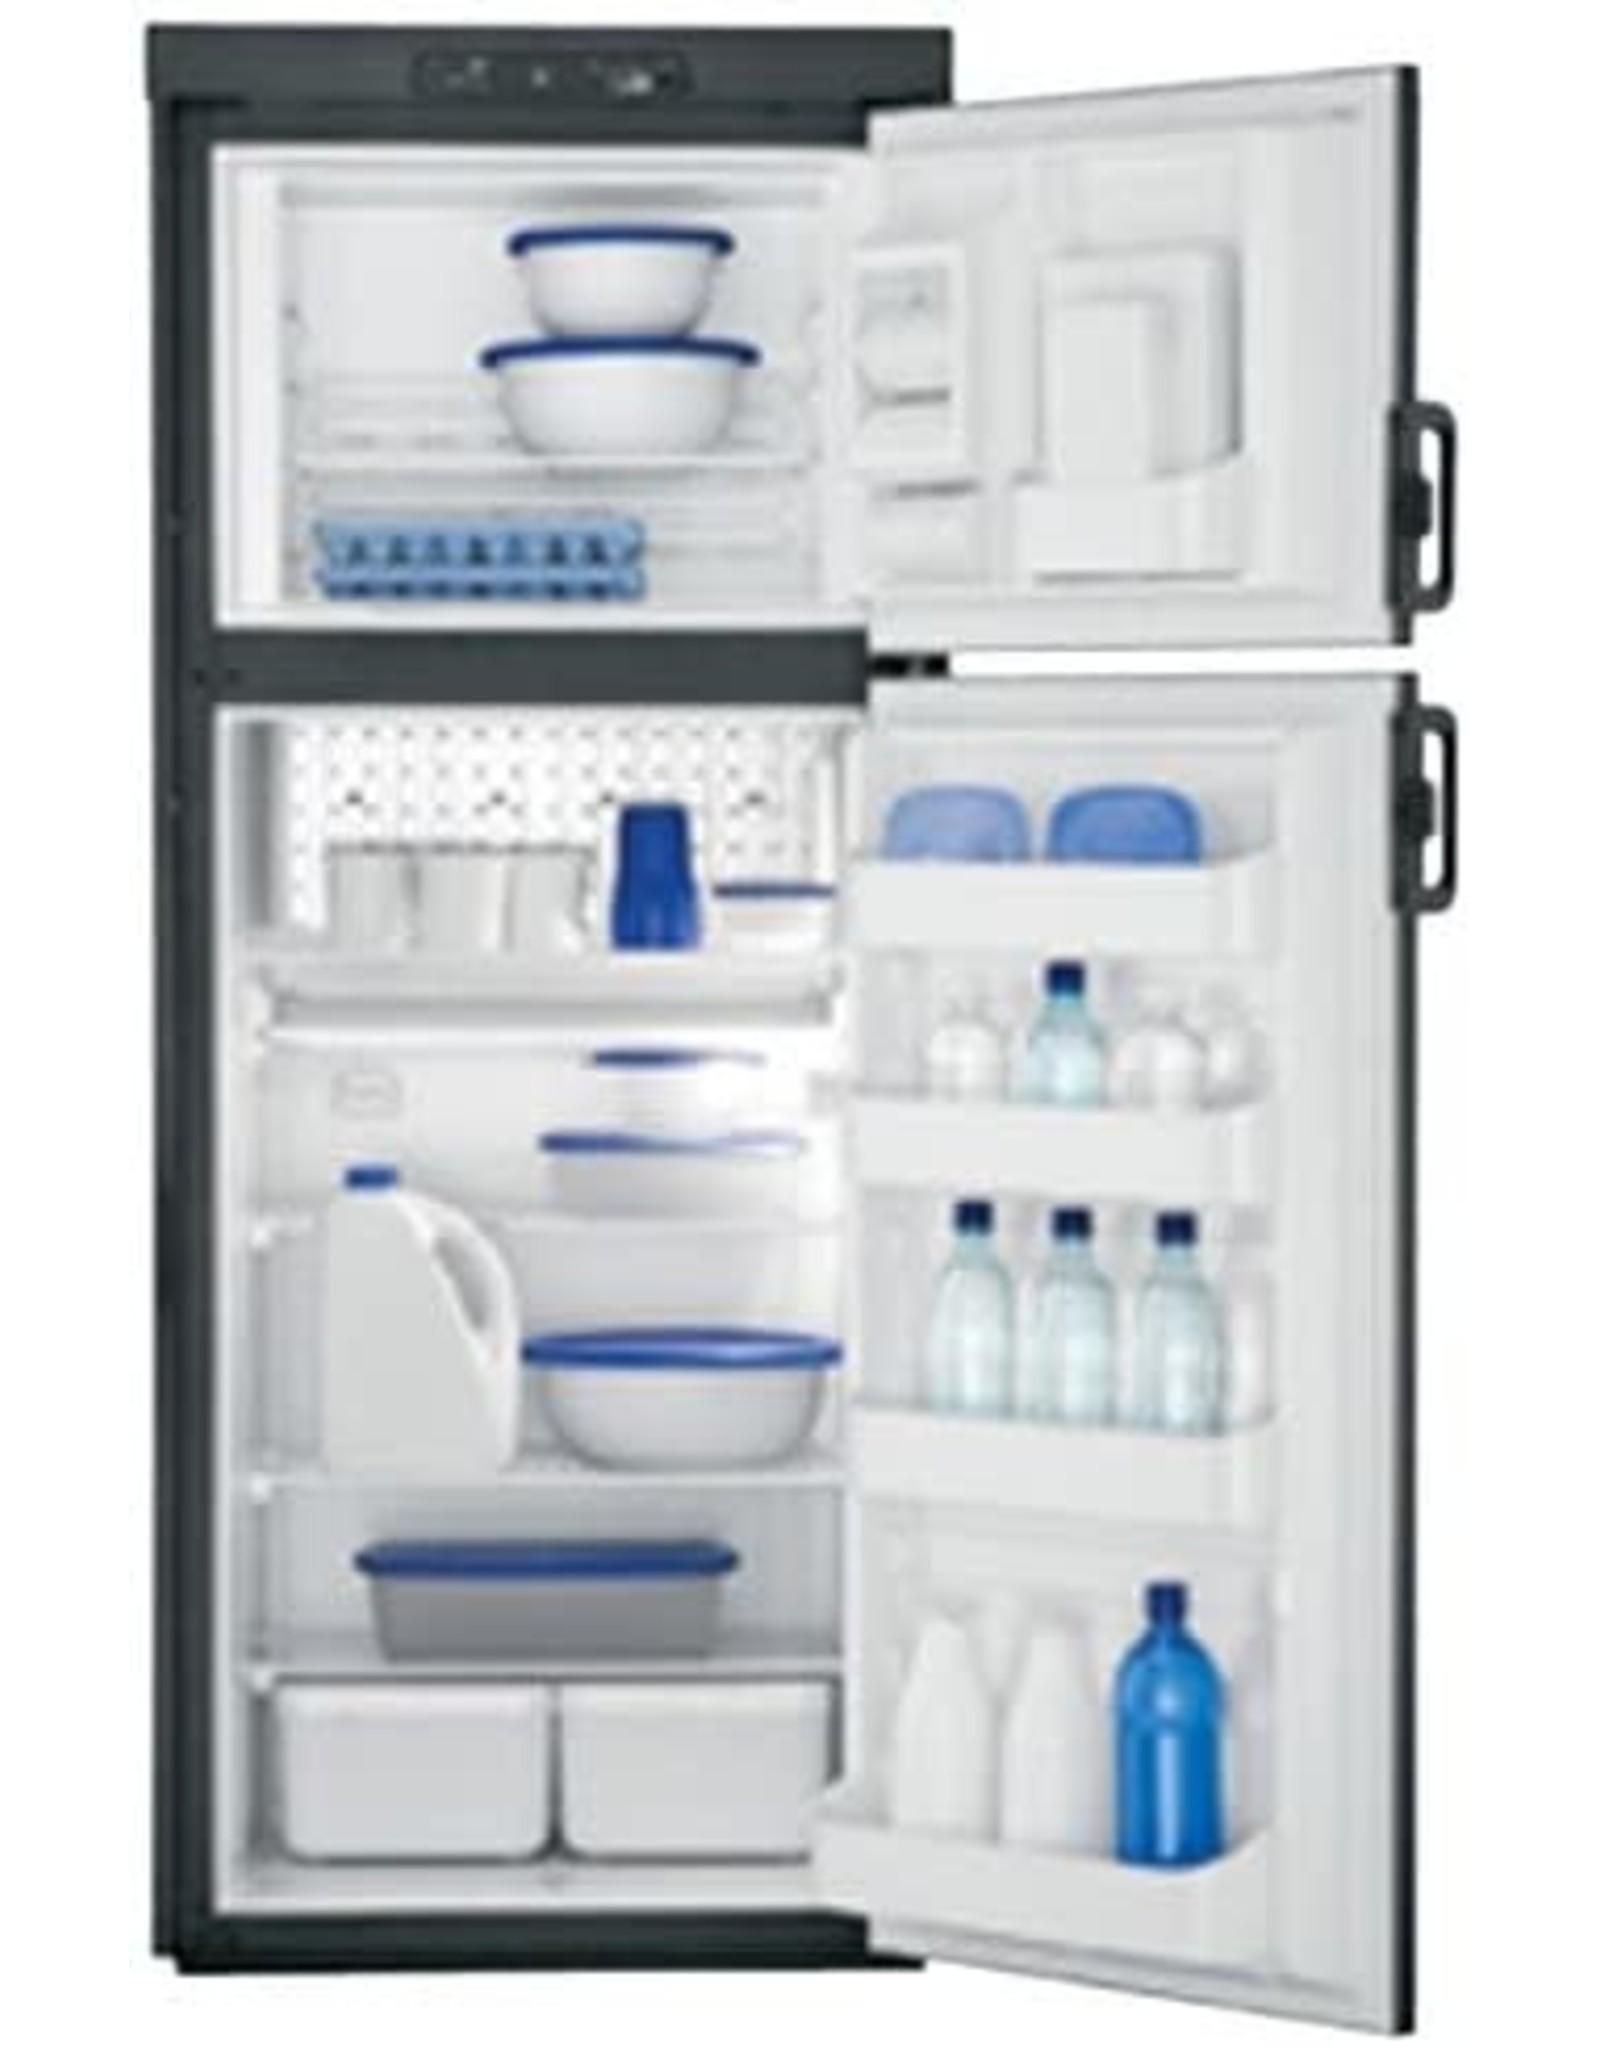 DOMETIC DOMETIC DM2862RB 8.0 Cubic Feet 2-Way Refrigerator